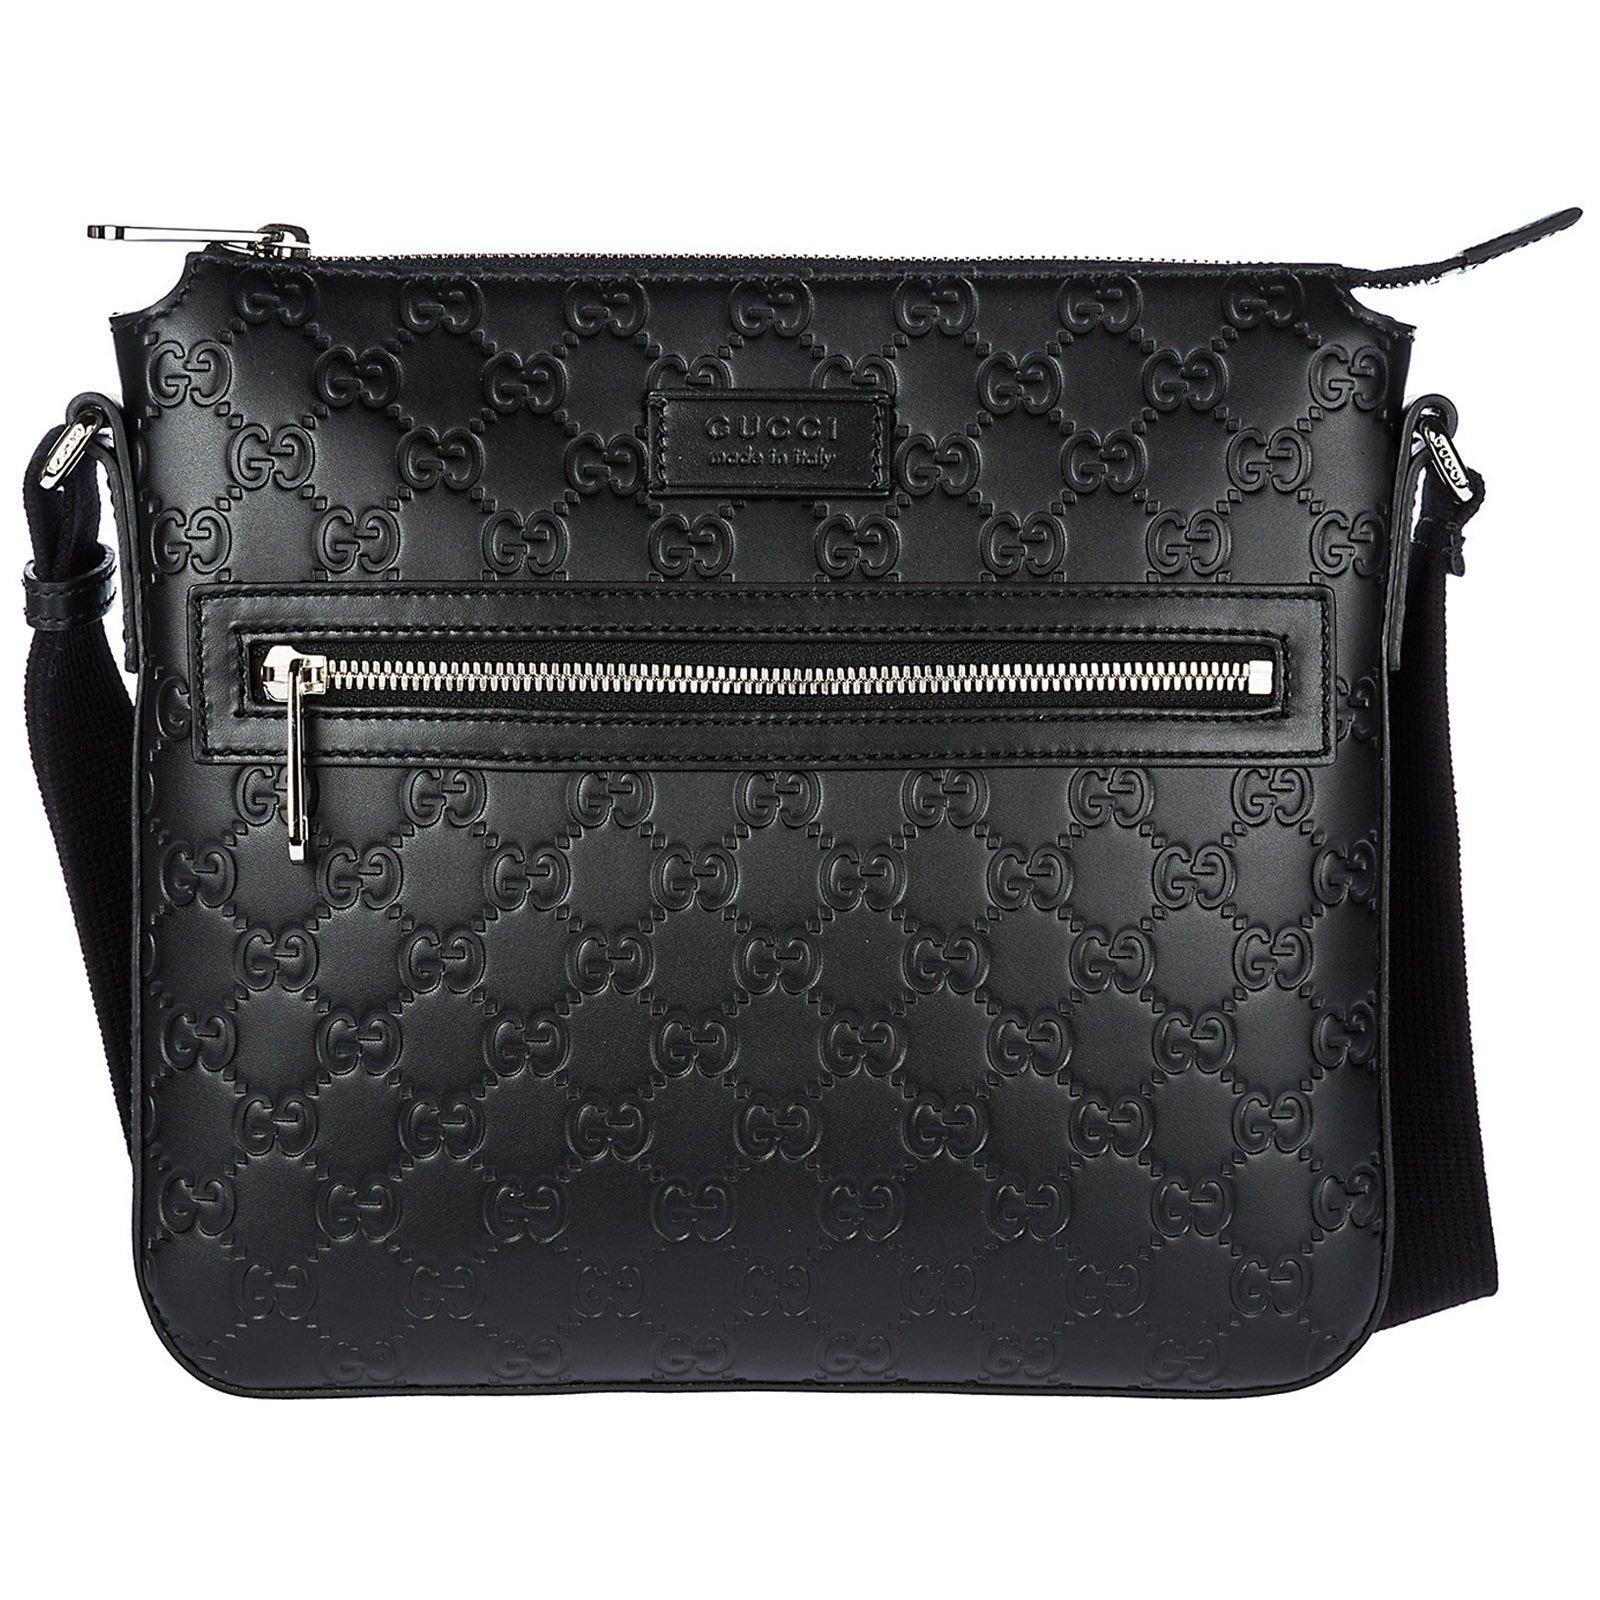 43a0861657d Gucci Signature Embossed Messenger Bag In Black Signature. CETTIRE